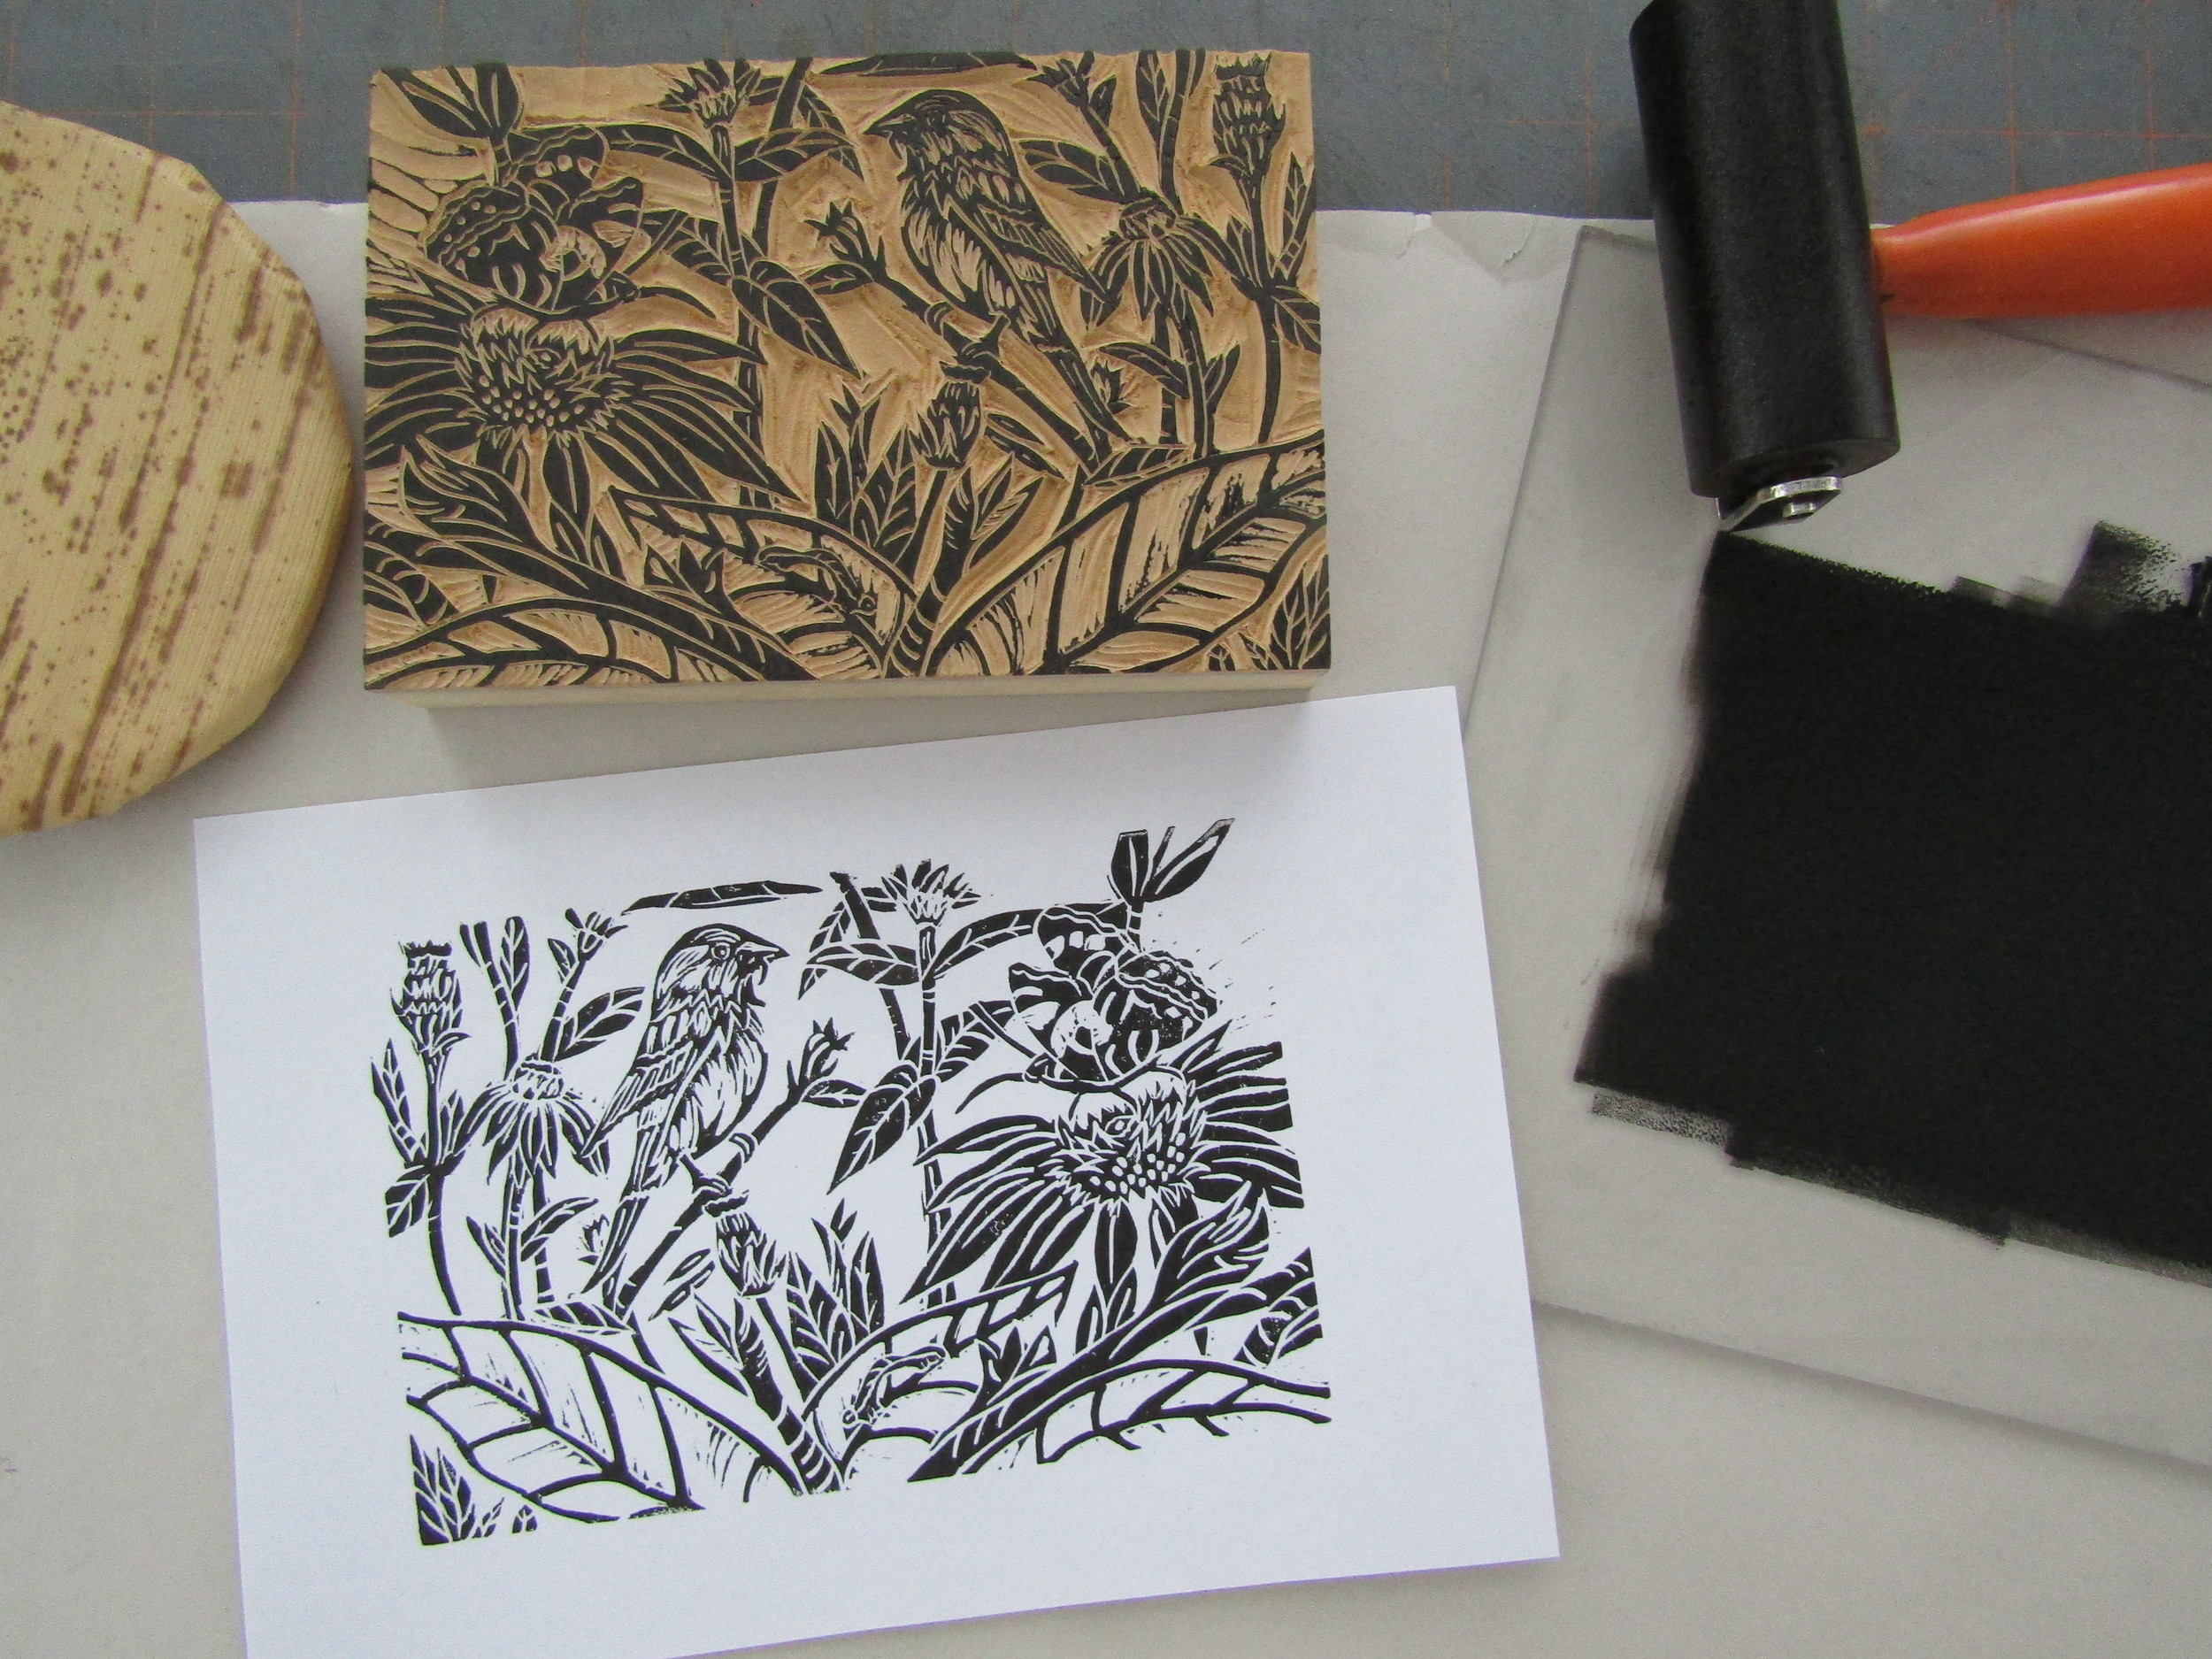 Proofing the print in my studio.